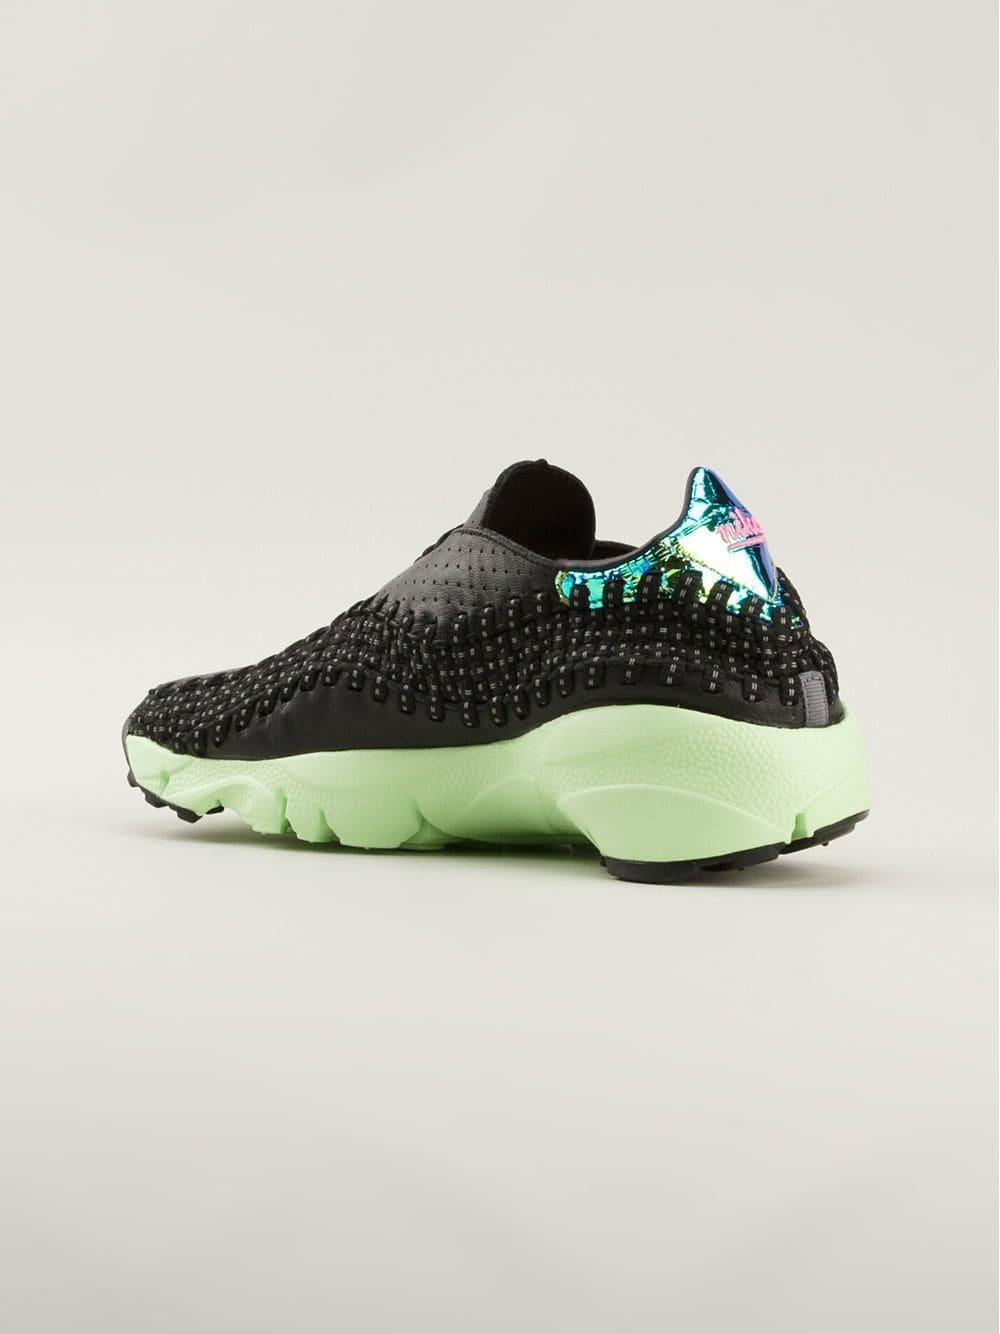 Zapatillas Air Footscape WVN MTN City QS' Nike de Algodón de color Negro para hombre